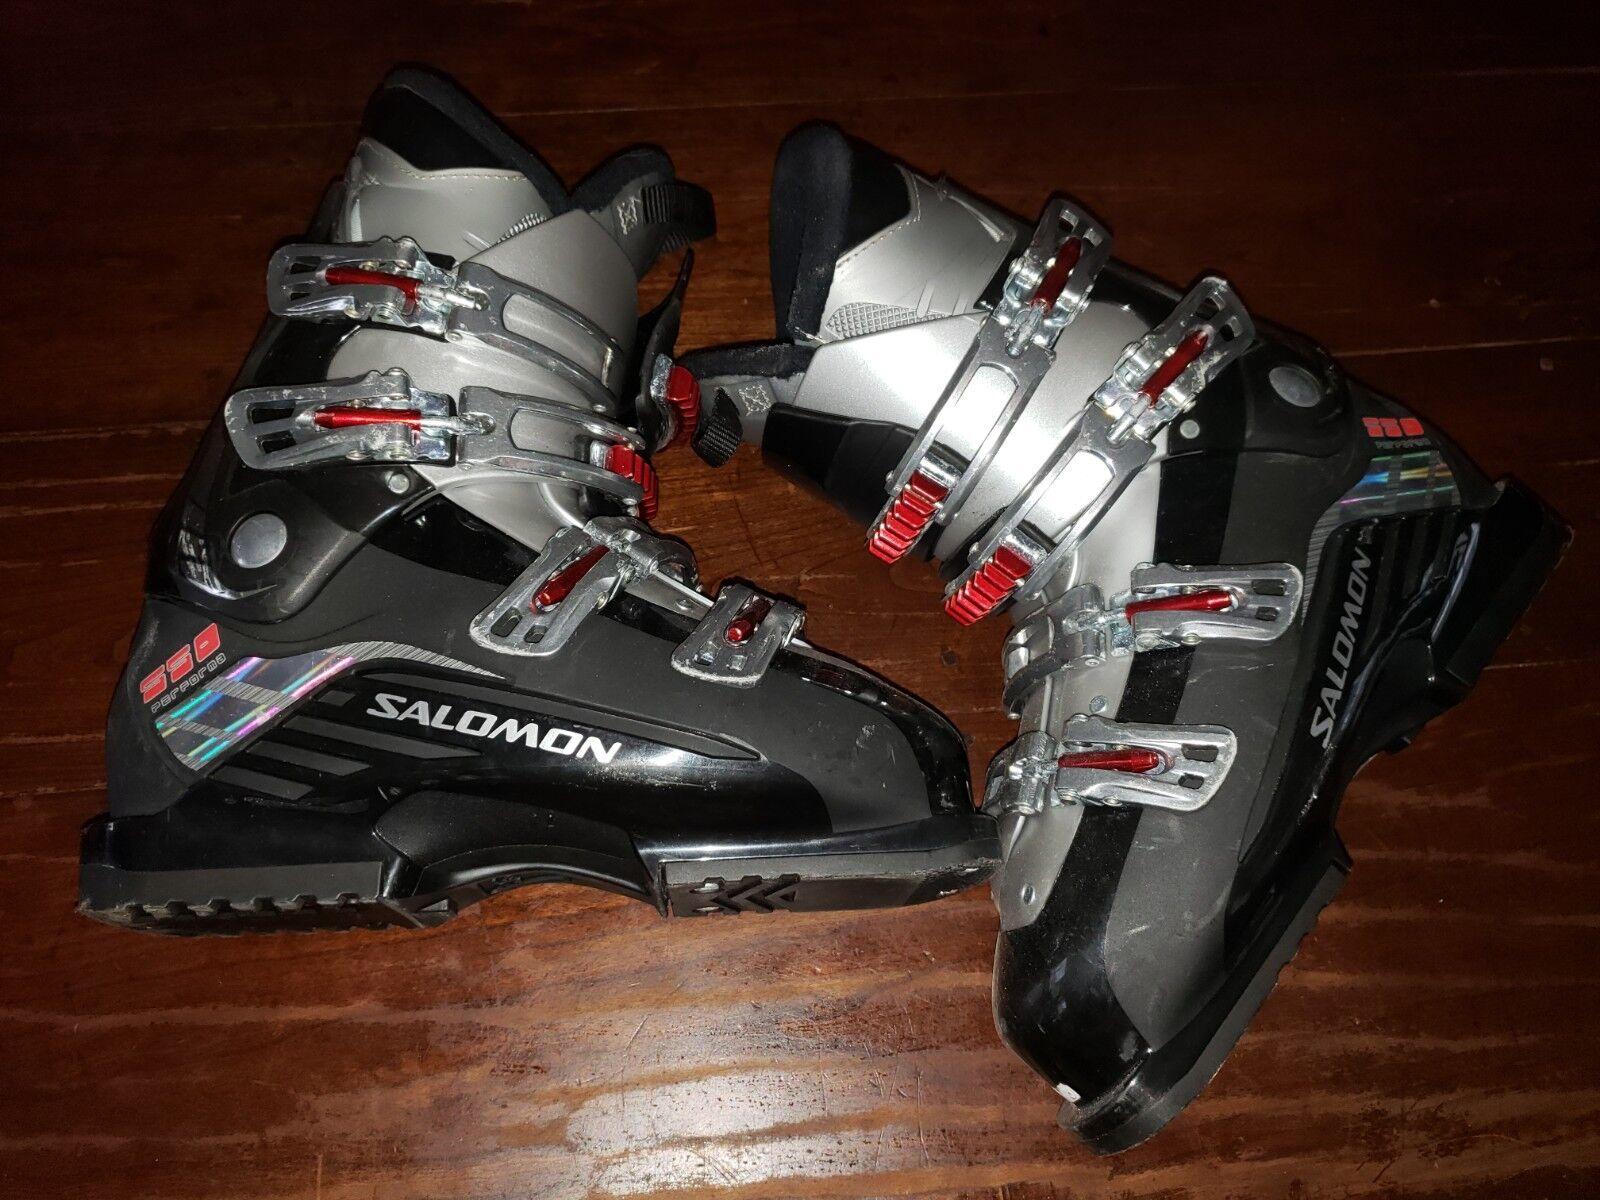 Salomon Performa 550 Downhill SKI SKIING BOOTS 26.5